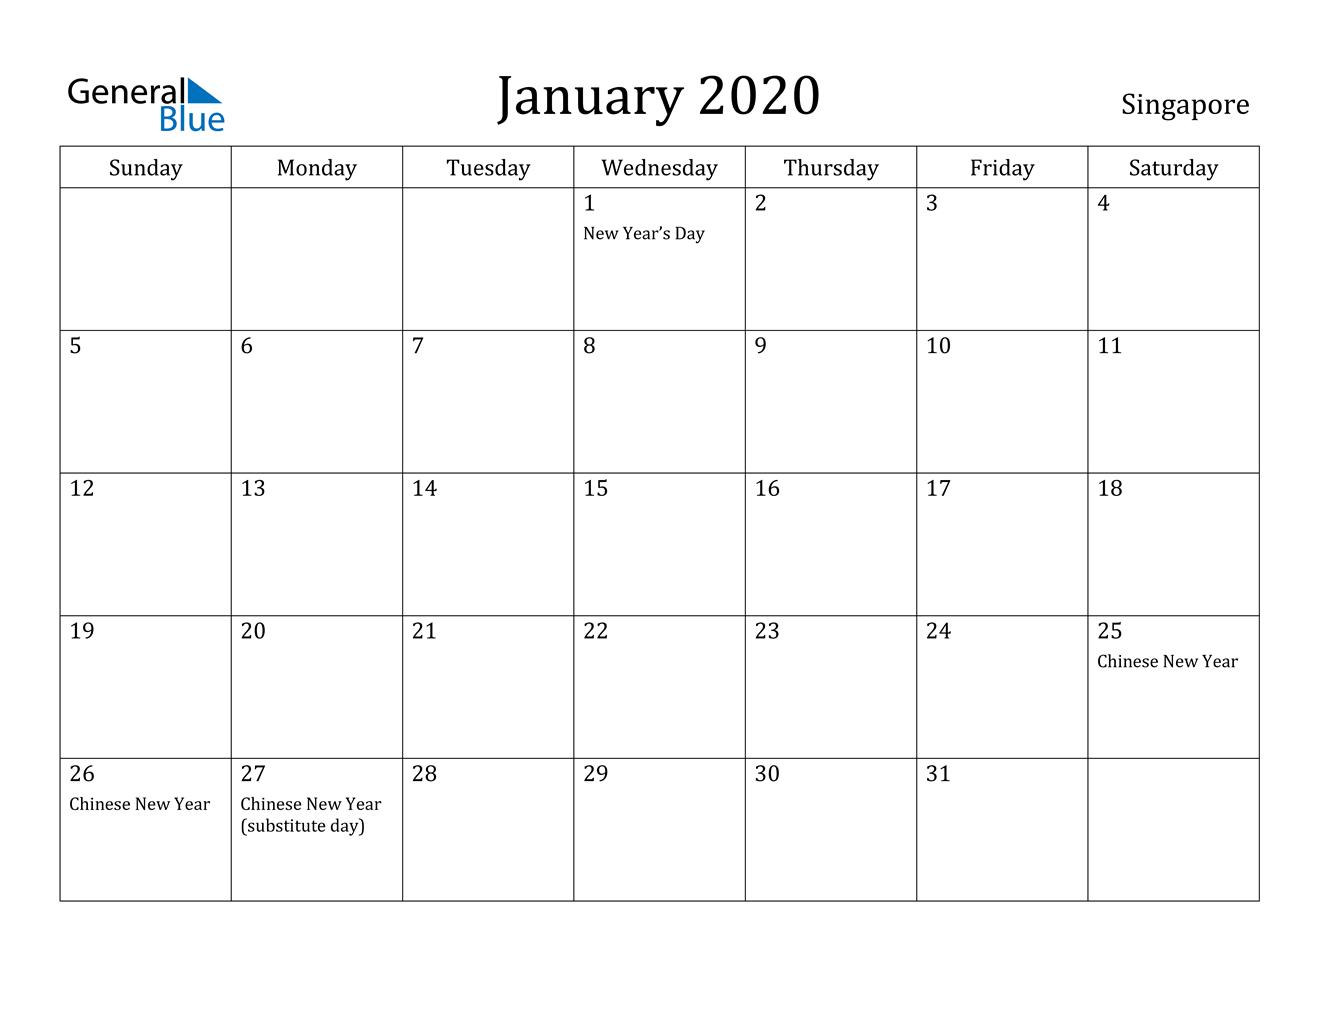 January 2020 Calendar  Singapore for Jan 2020 Calendar